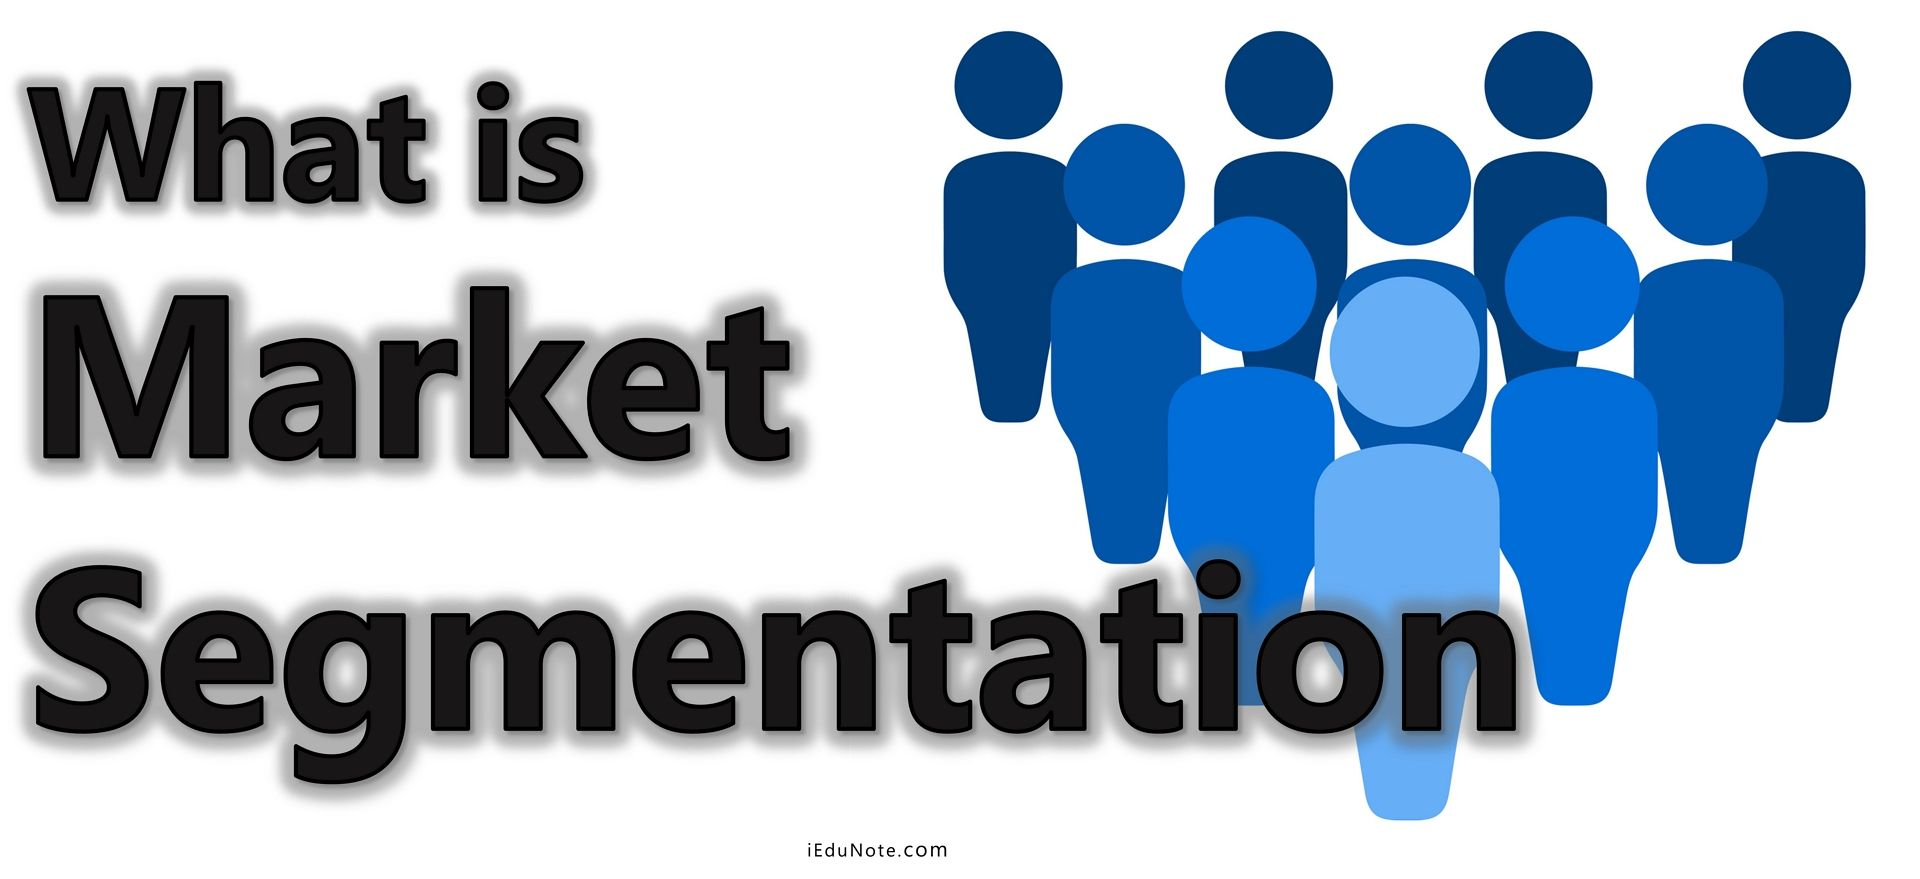 Market Segmentation Definition Meaning Bases Importance Types In 2020 Market Segmentation What Is Marketing Segmentation